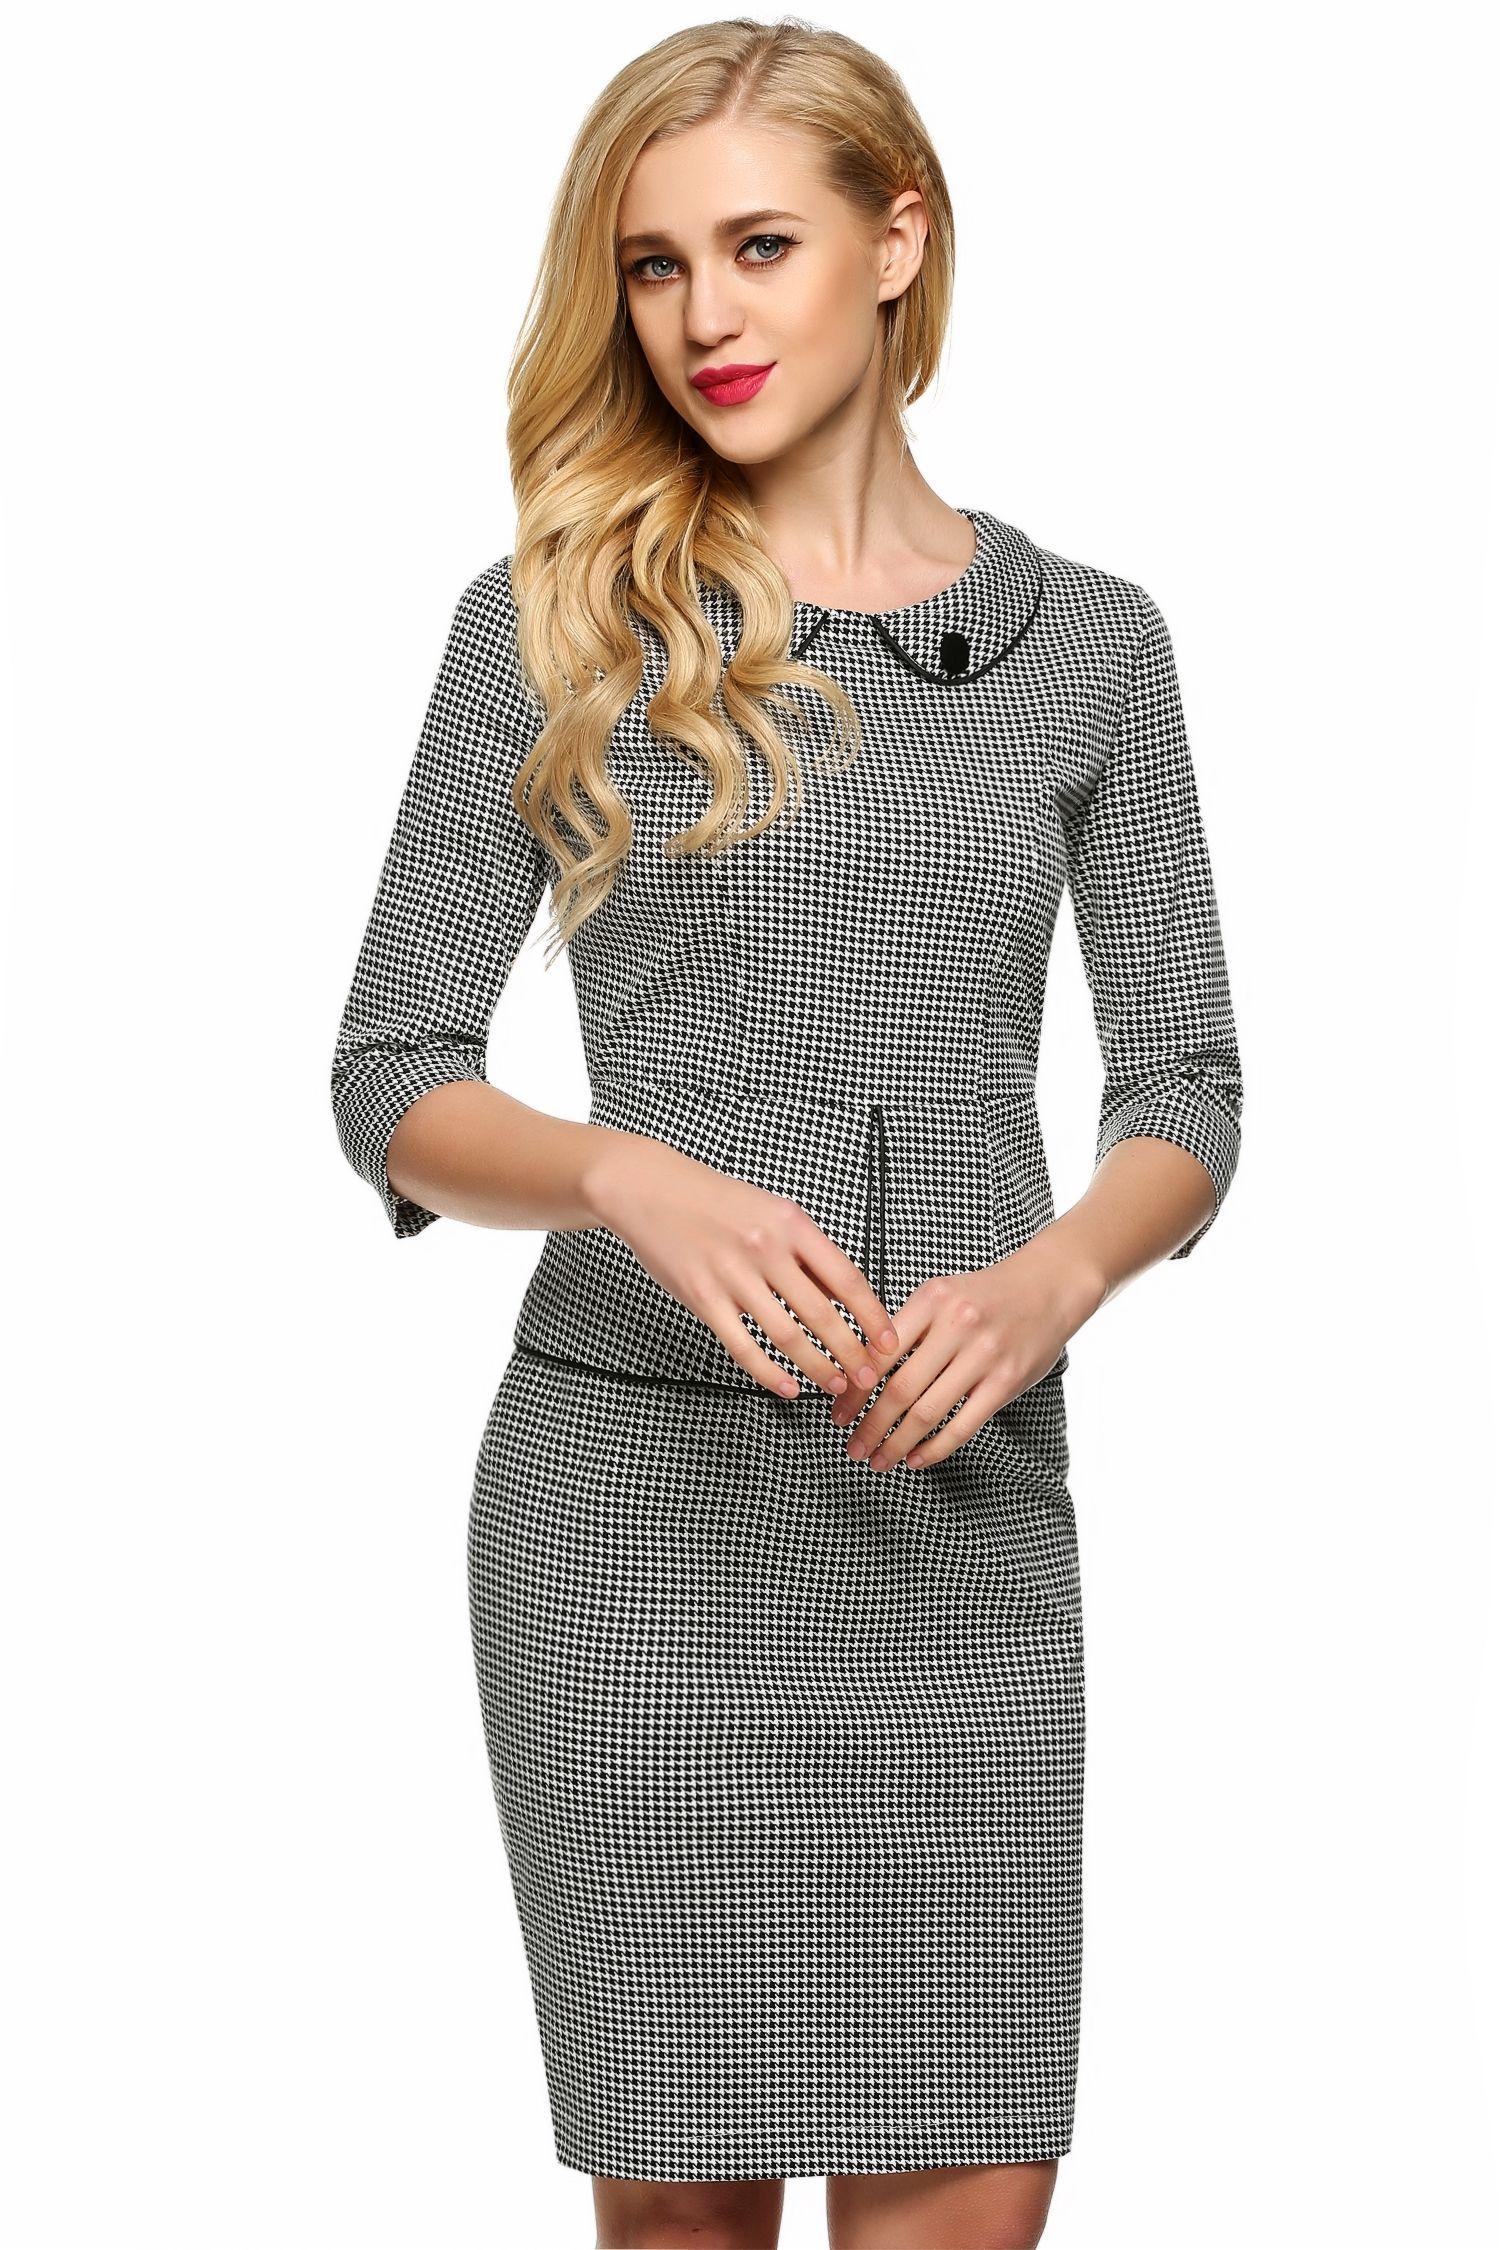 Grey Angvng Casual Women Dresses Dresses Casual Dresses For Women Elegant Dress [ 2250 x 1500 Pixel ]